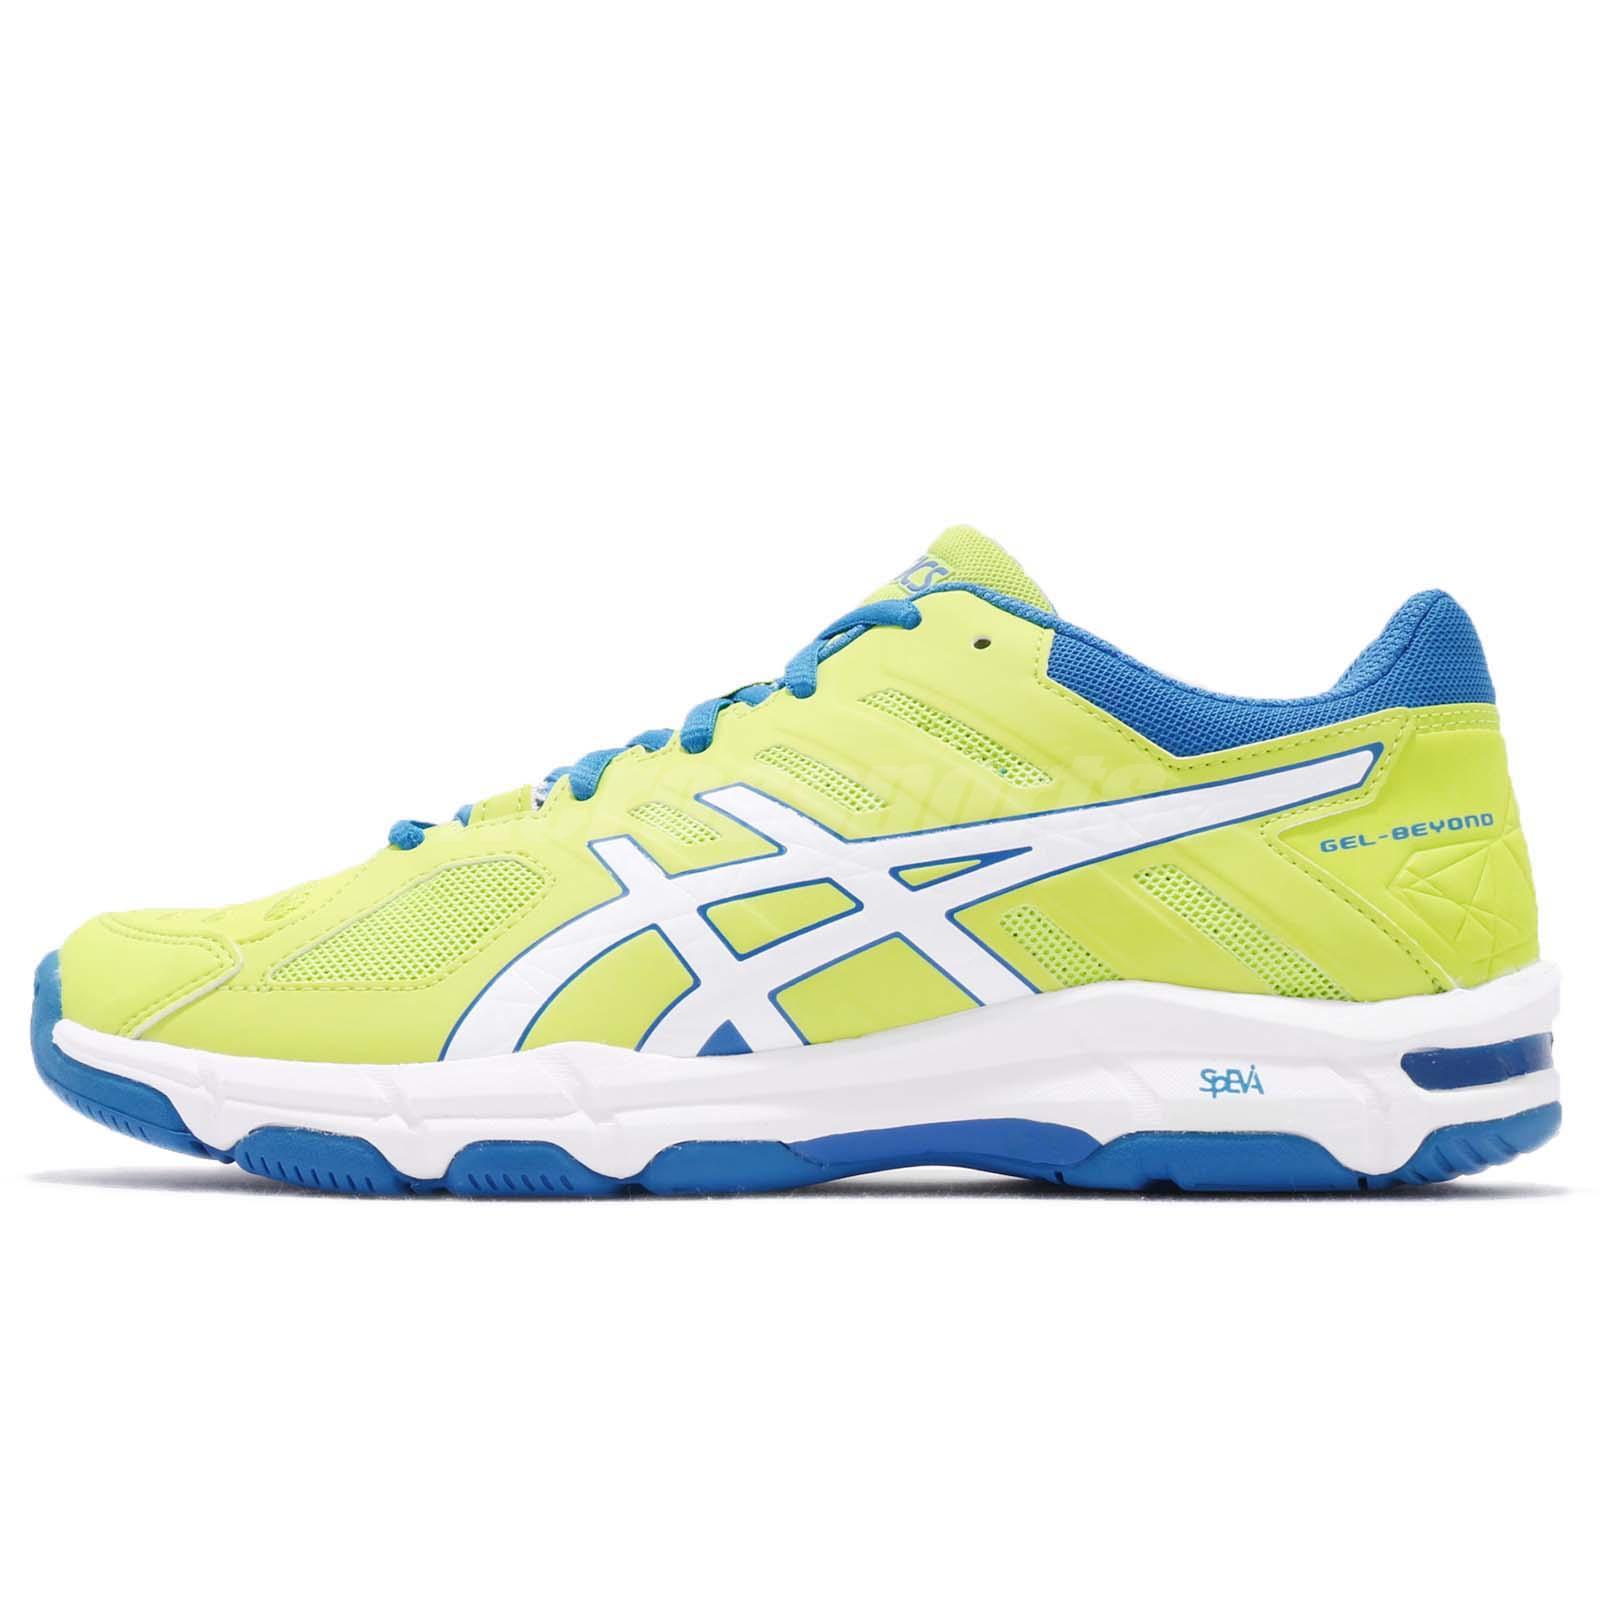 89b4c6eecbf Asics Gel-Beyond 5 V Energy Green White Men Badminton Volleyball Shoe  B601N-7701